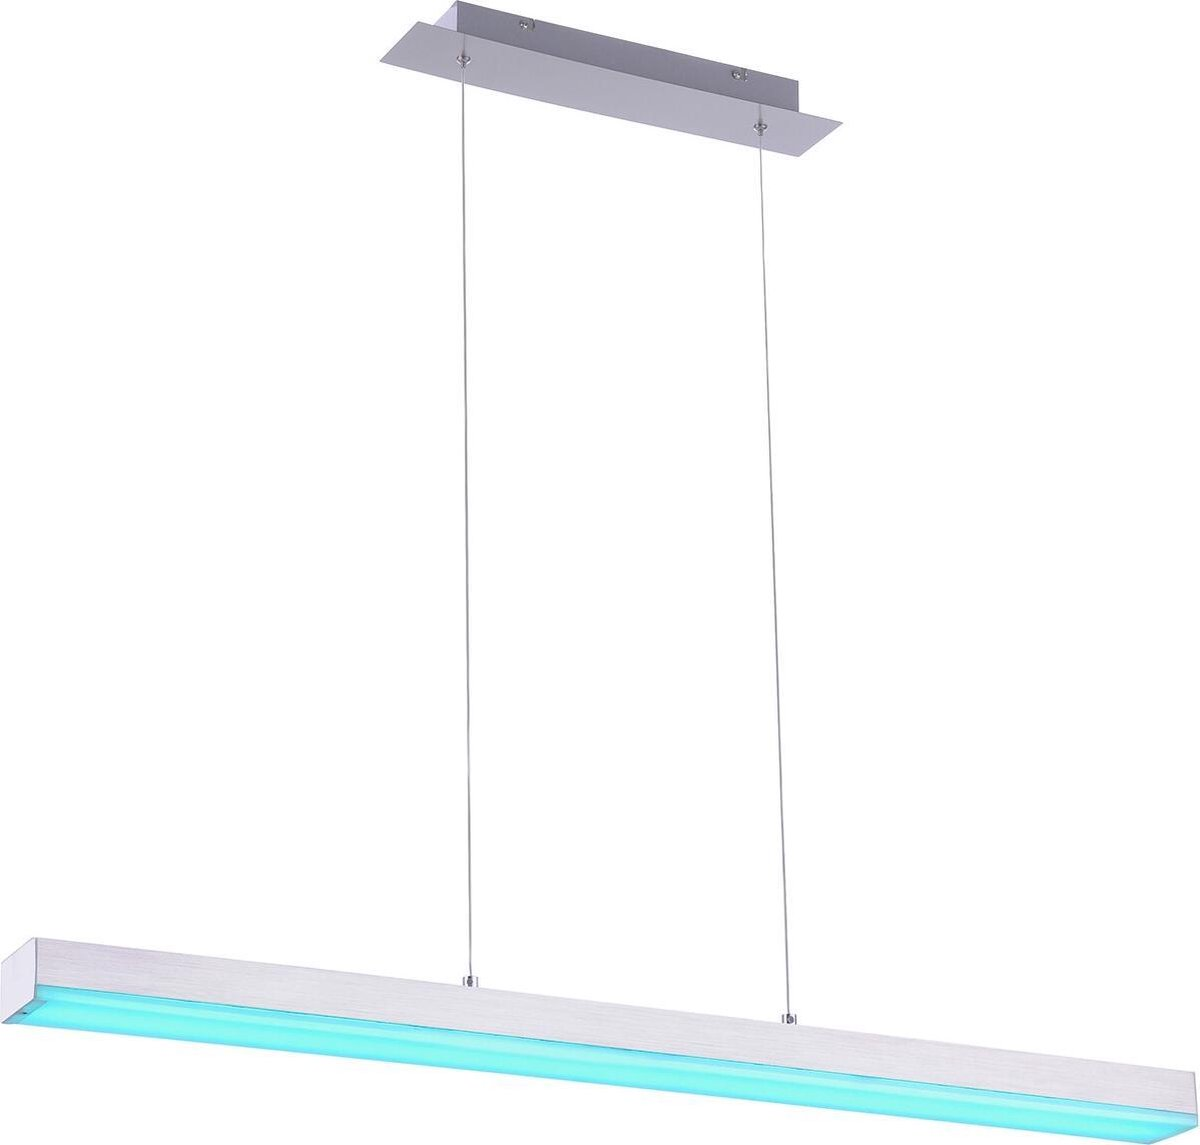 LED Hanglamp WiZ - Smart LED - Hangverlichting - Iona Lavar - 20W - Aanpasbare Kleur - RGBW - Rechthoek - Mat Nikkel - Aluminium